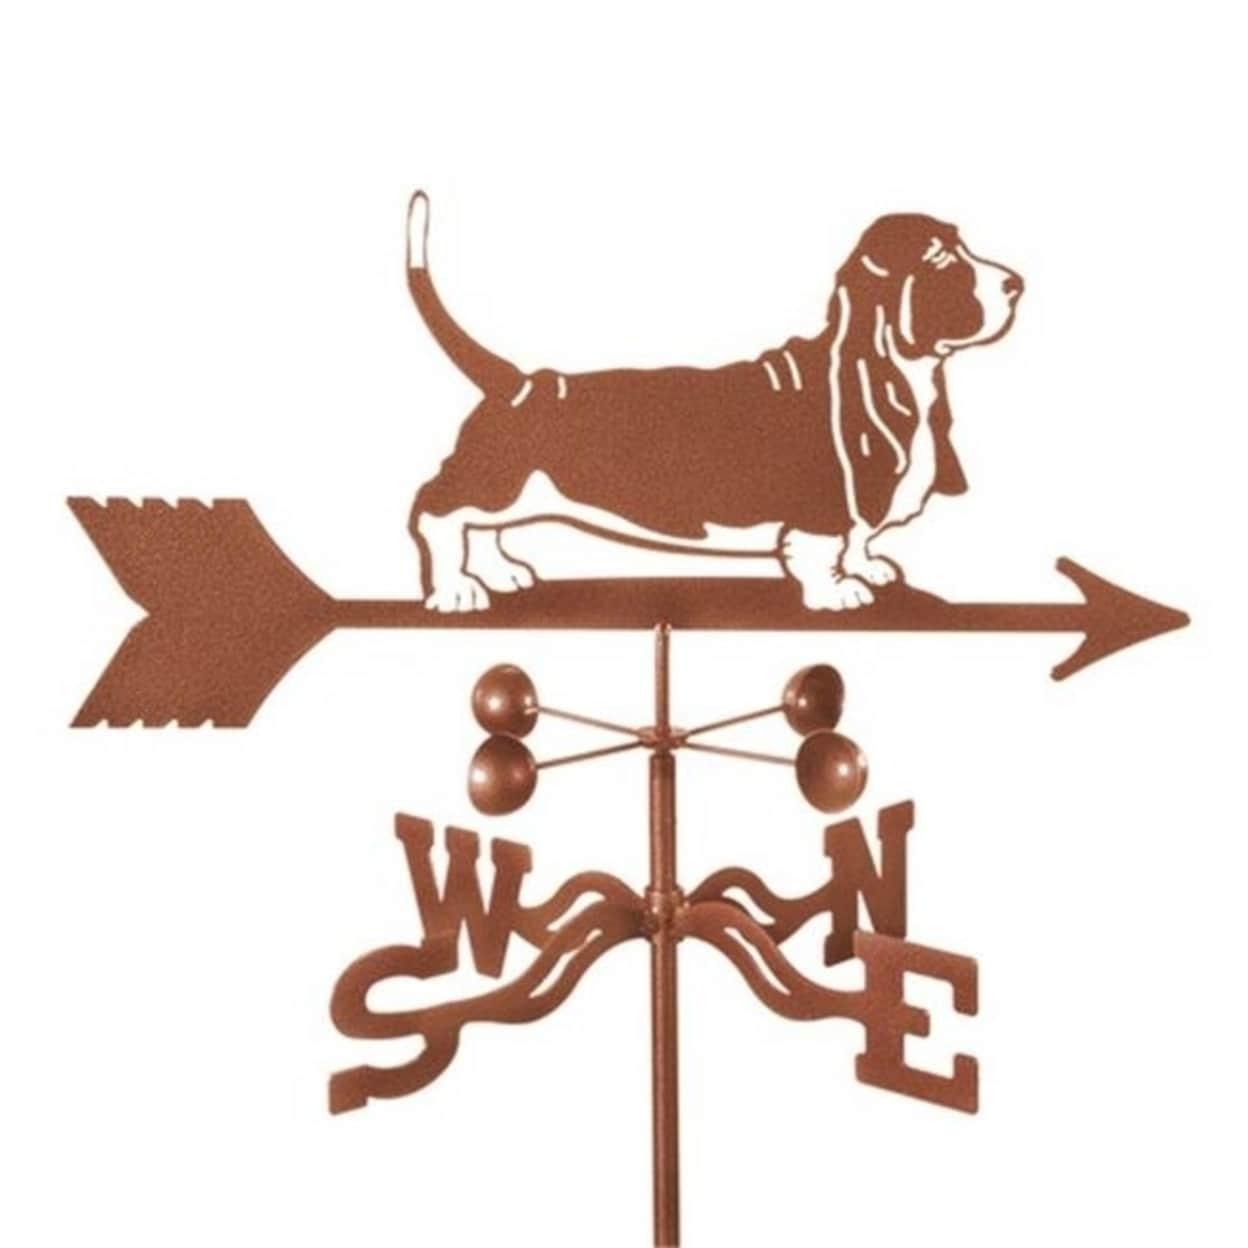 Ez Vane Ez1400 Rf Dog Basset Hound Weathervane With Roof Mount Overstock 31324484